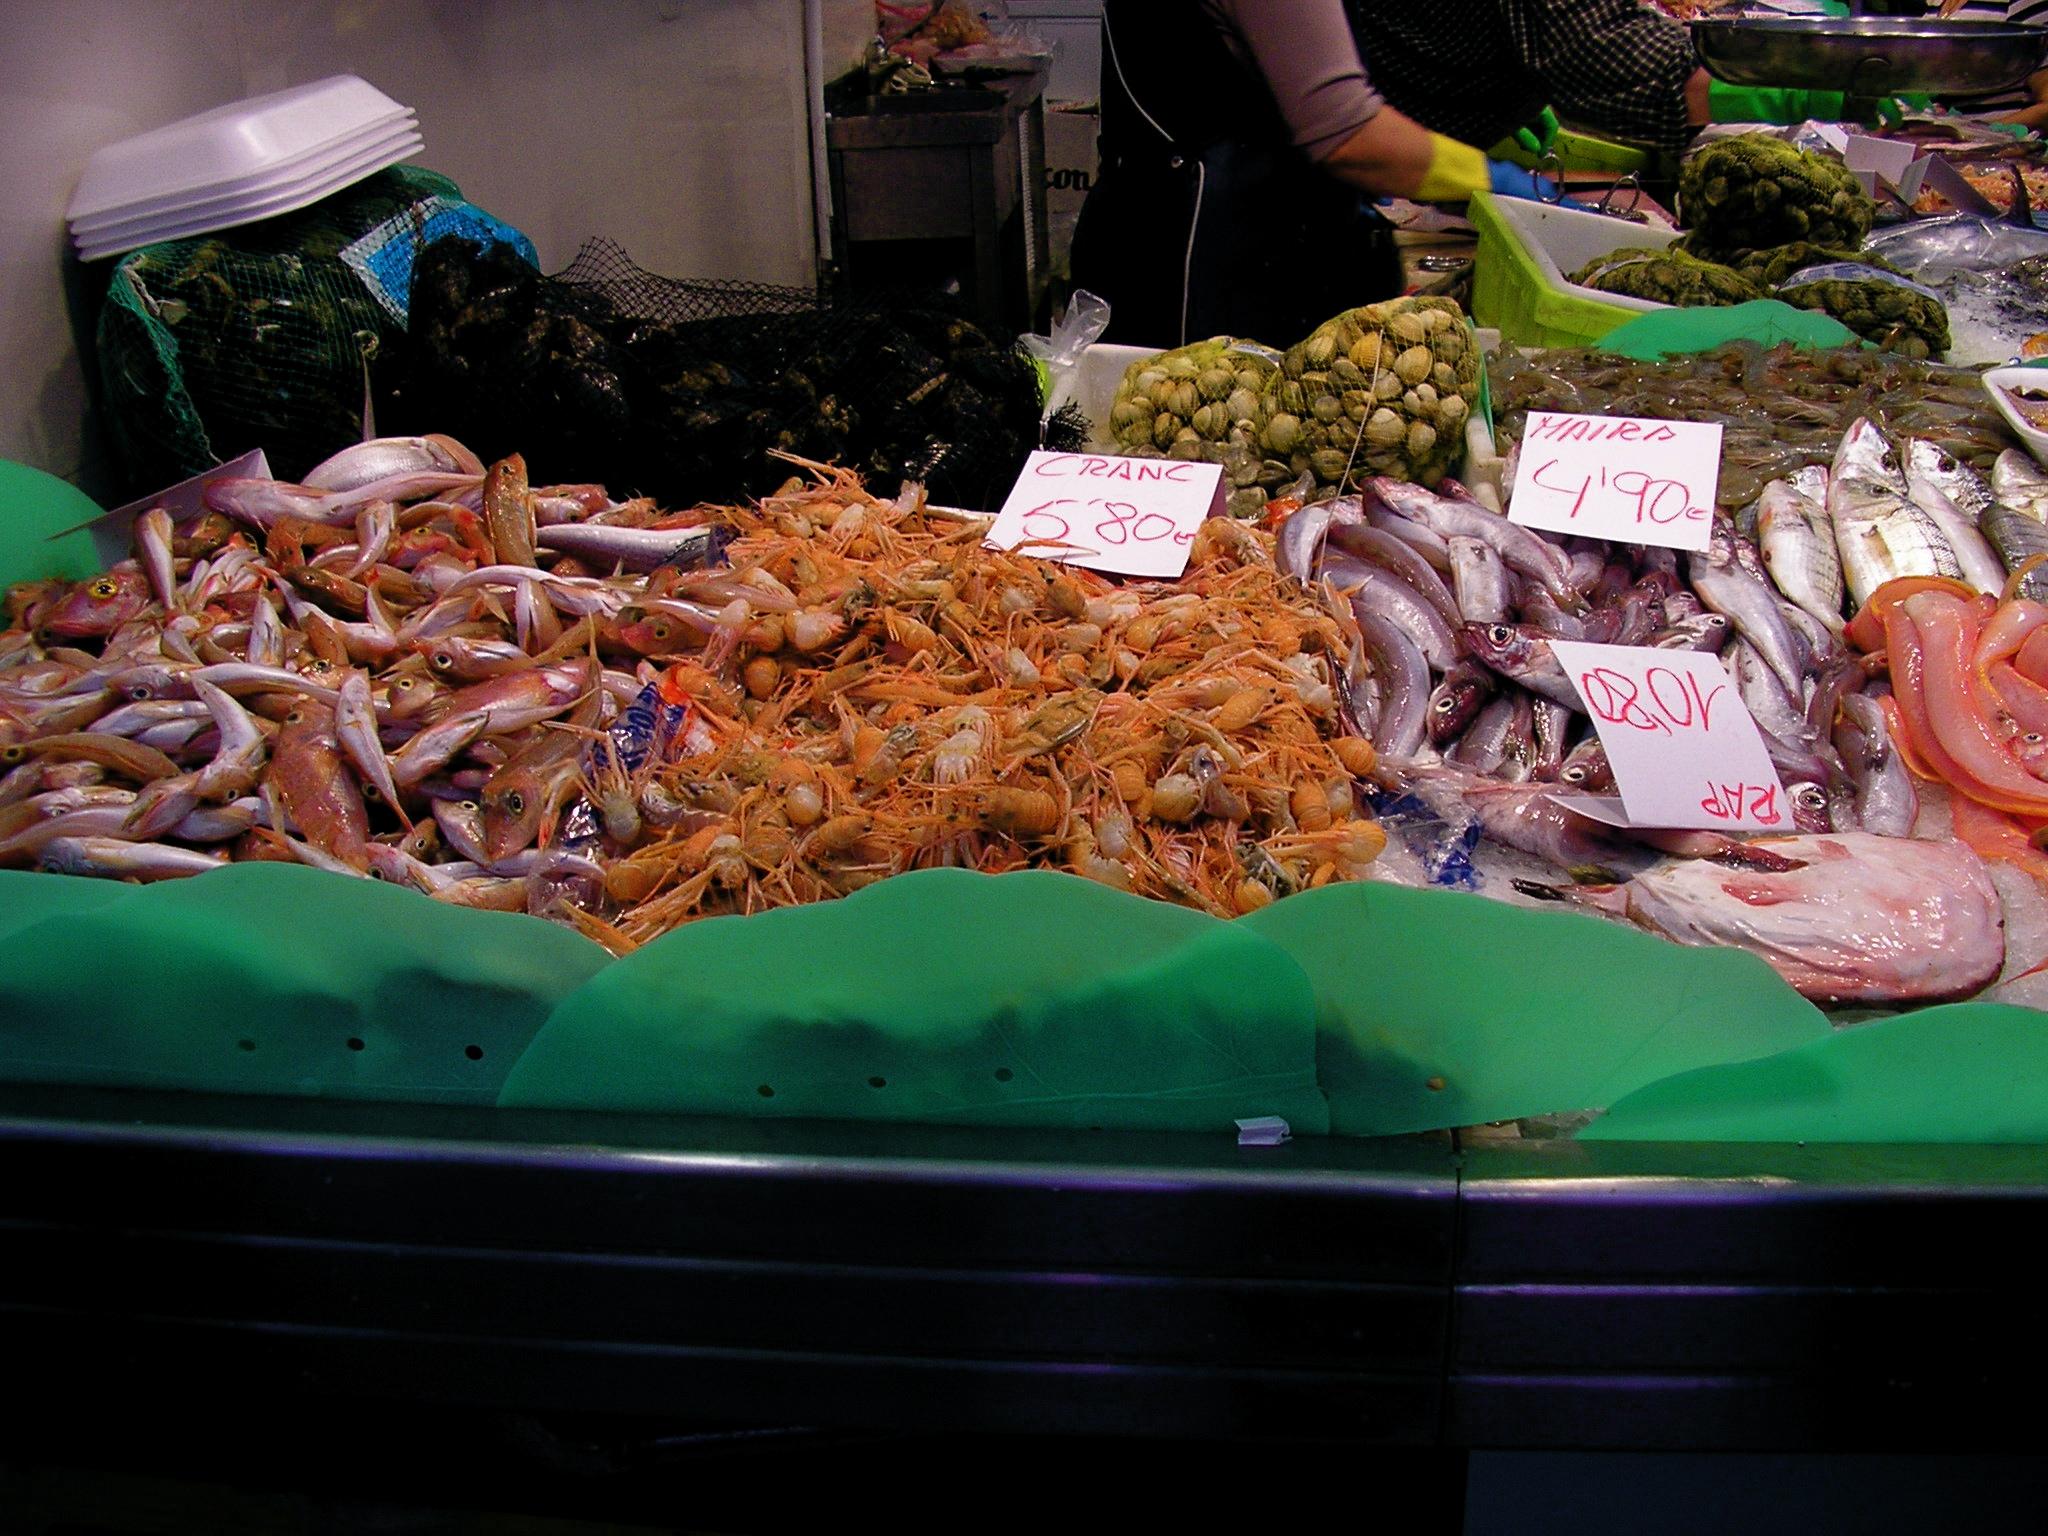 healthy food programs public health accreditation board community health assessments fish